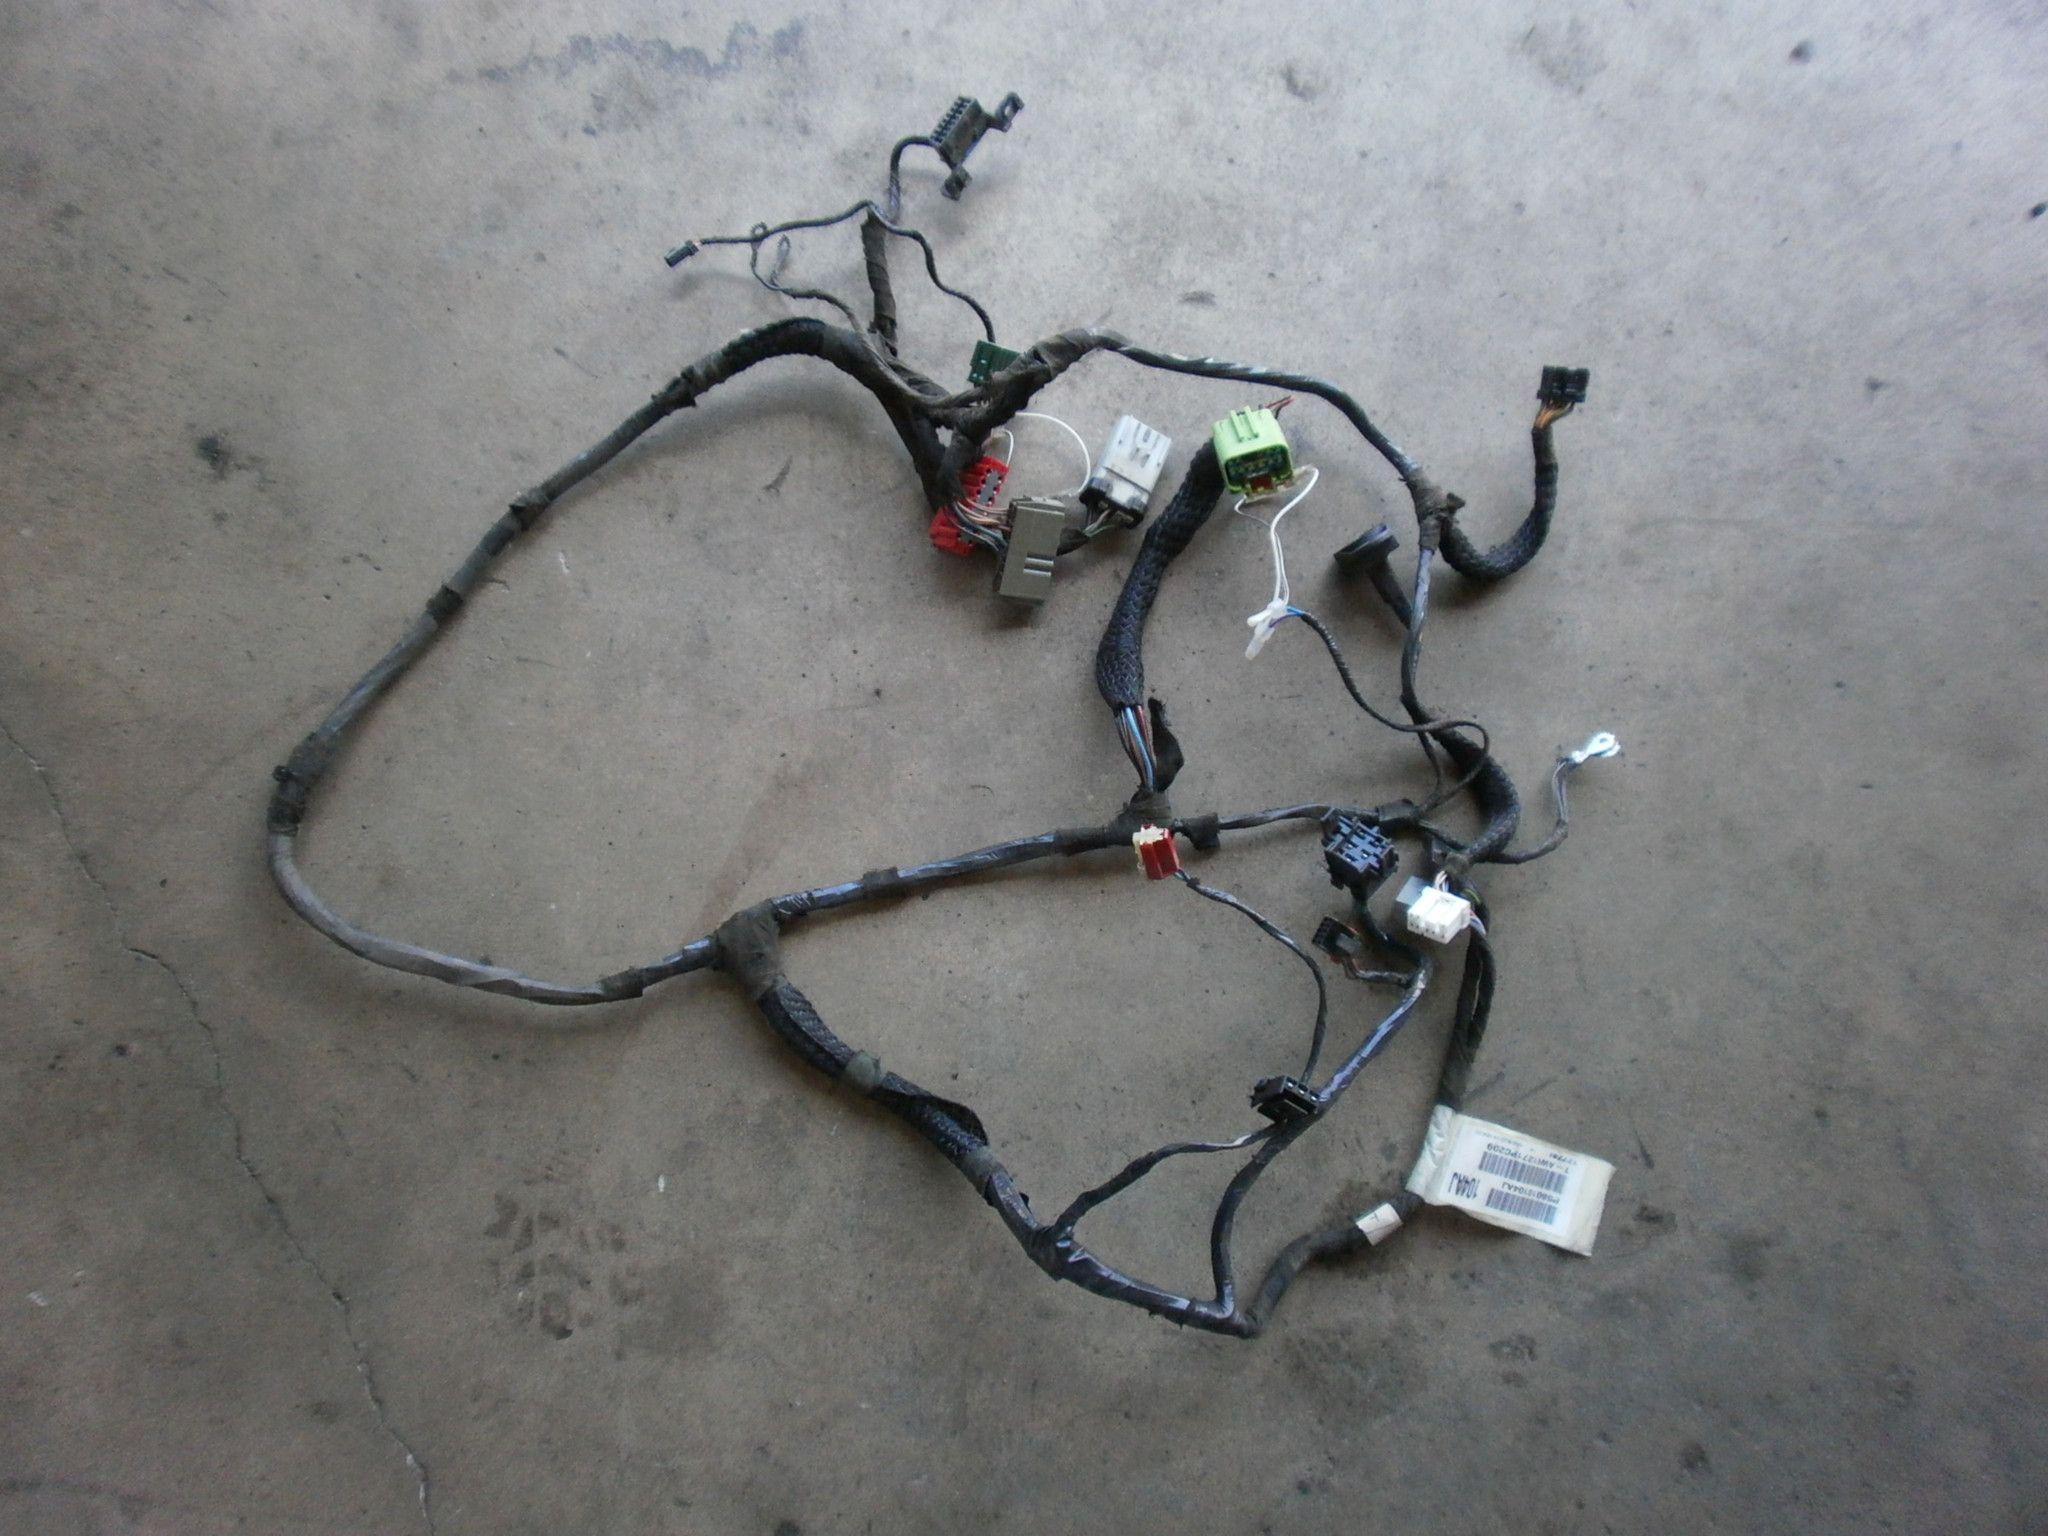 jeep wrangler tj instrument panel wiring harness 2001 p56010104aj oem good used 2 4 4 0 [ 2048 x 1536 Pixel ]